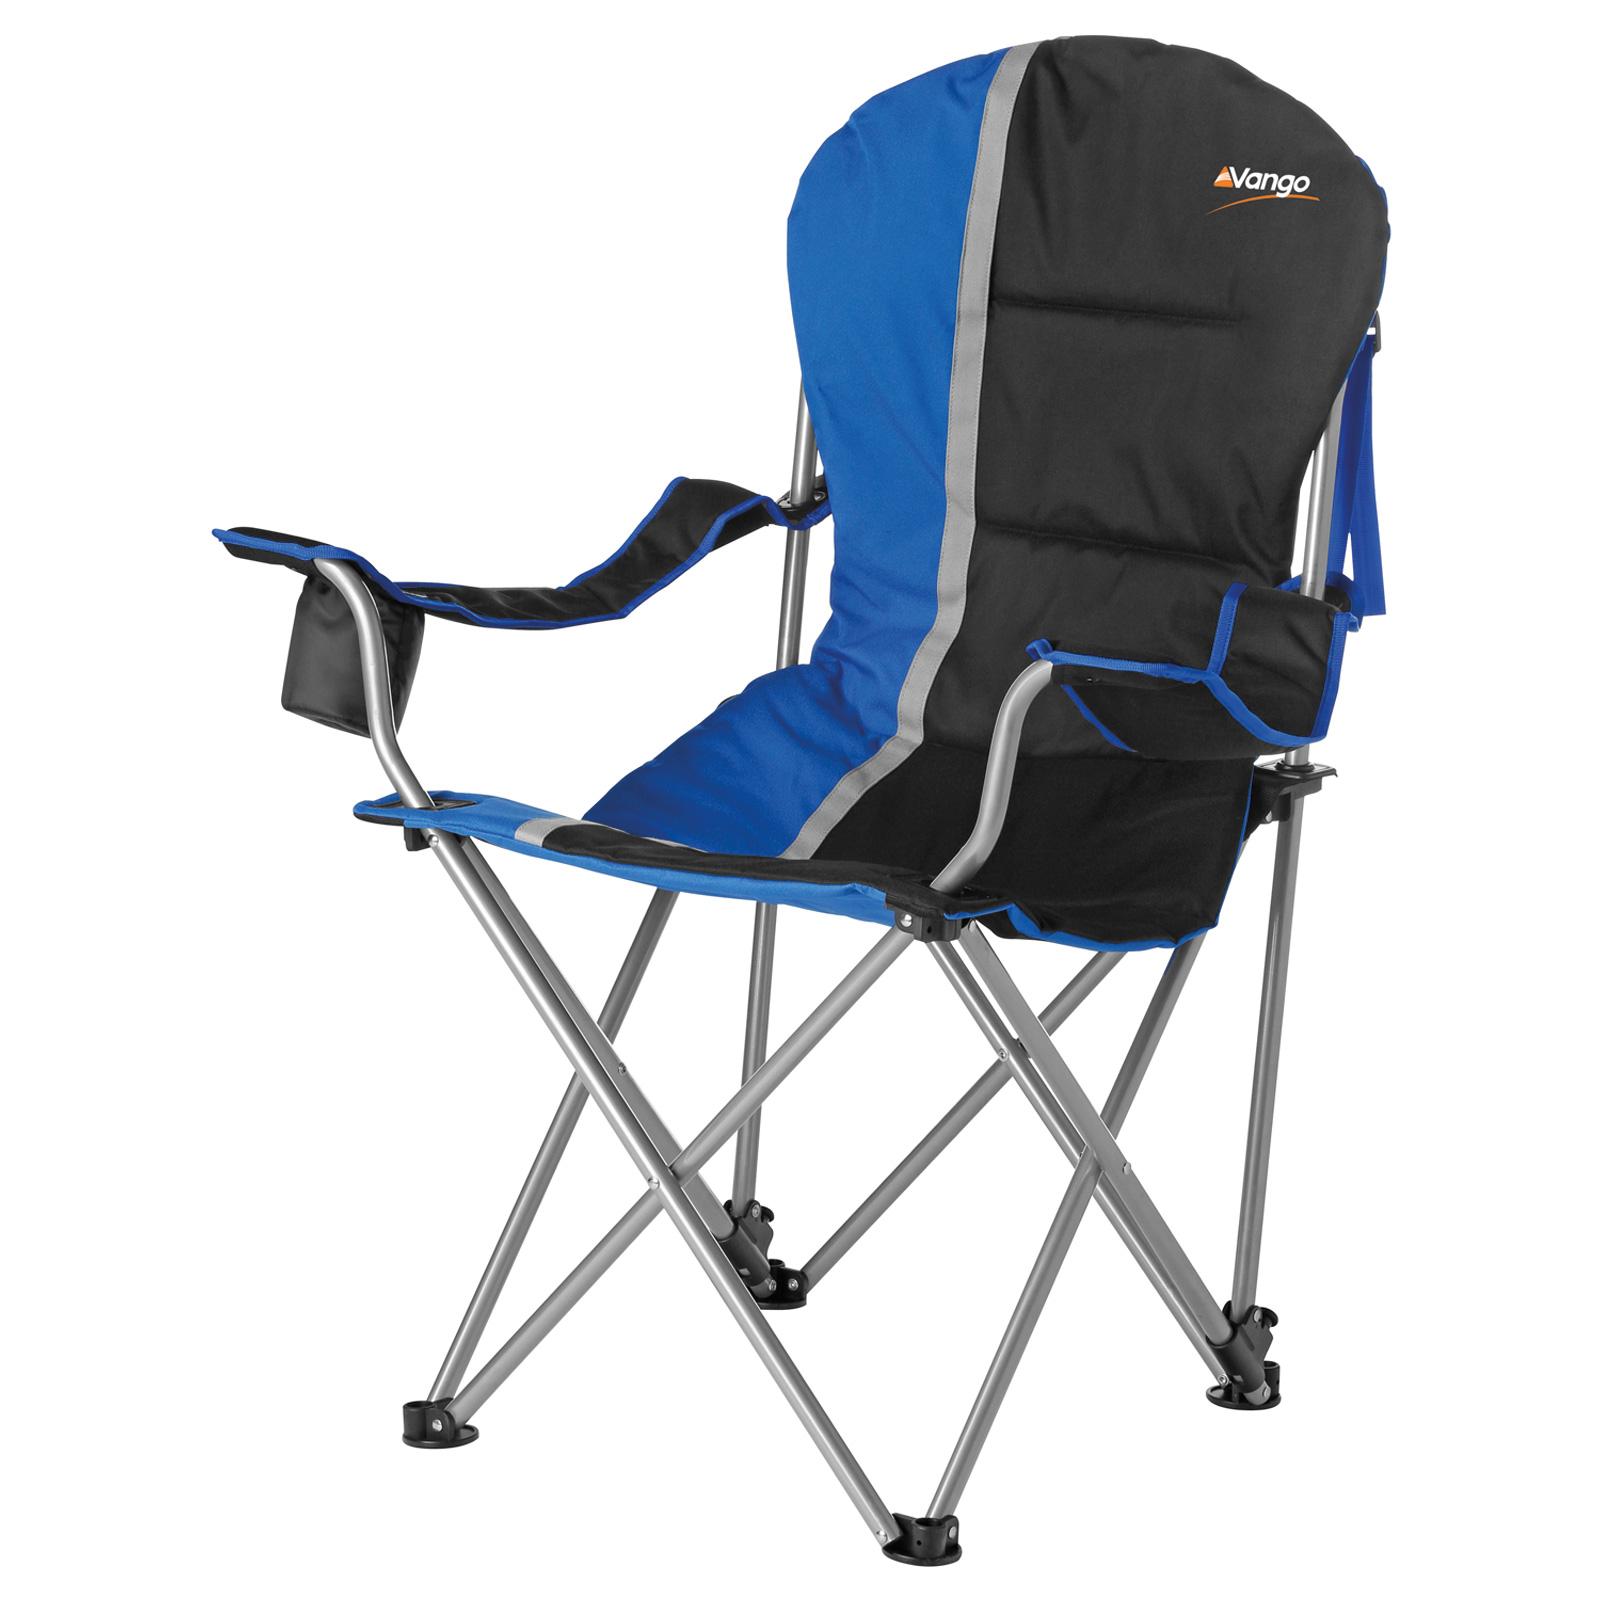 camping stuhl vango corona faltbarer campingstuhl. Black Bedroom Furniture Sets. Home Design Ideas